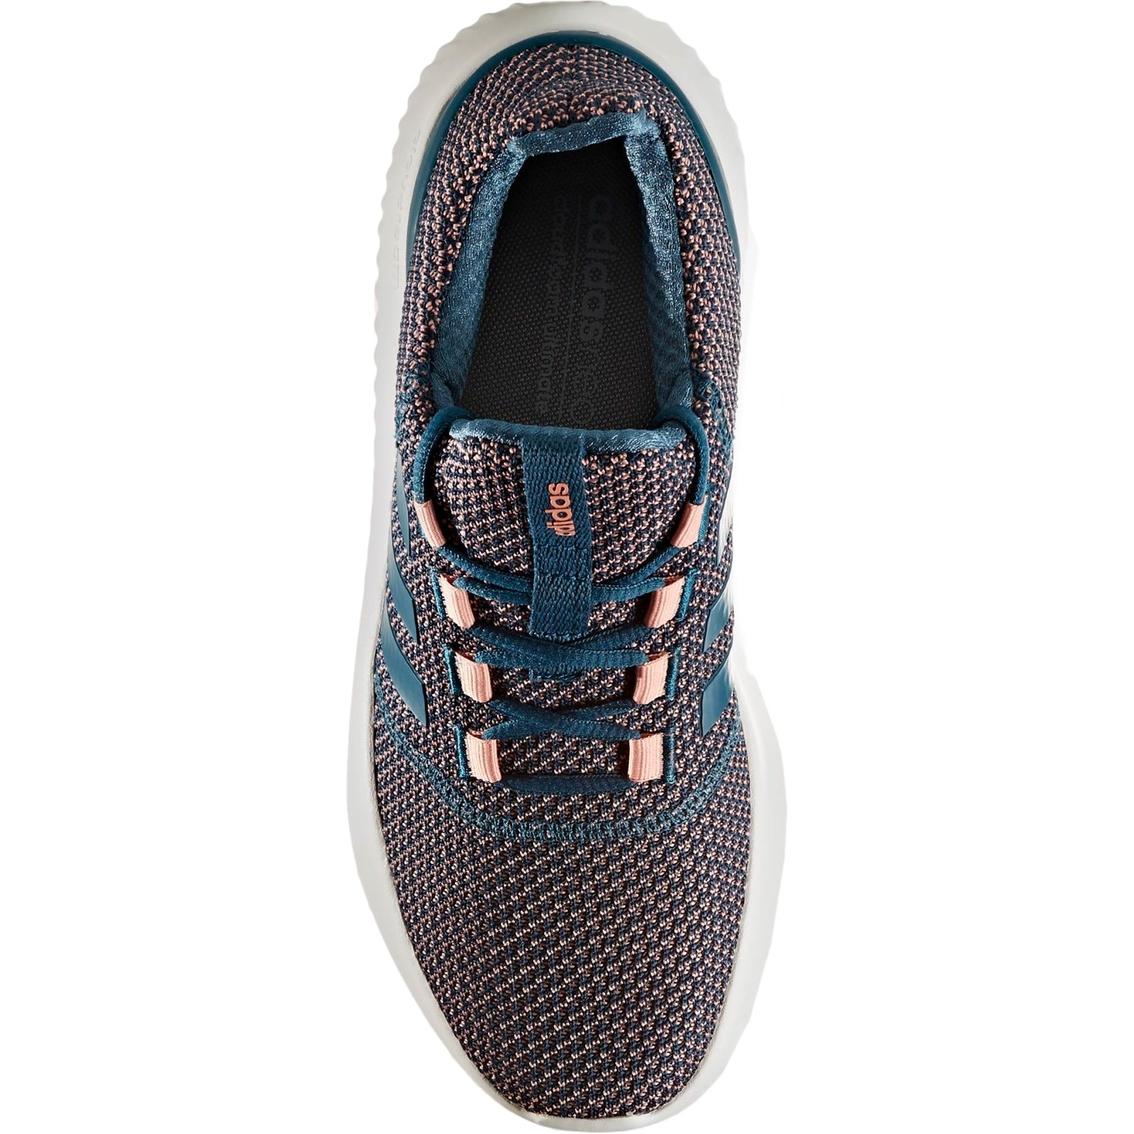 Adidas Women's Cloudfoam Ultimate Sneakers | Sneakers | Shoes ...